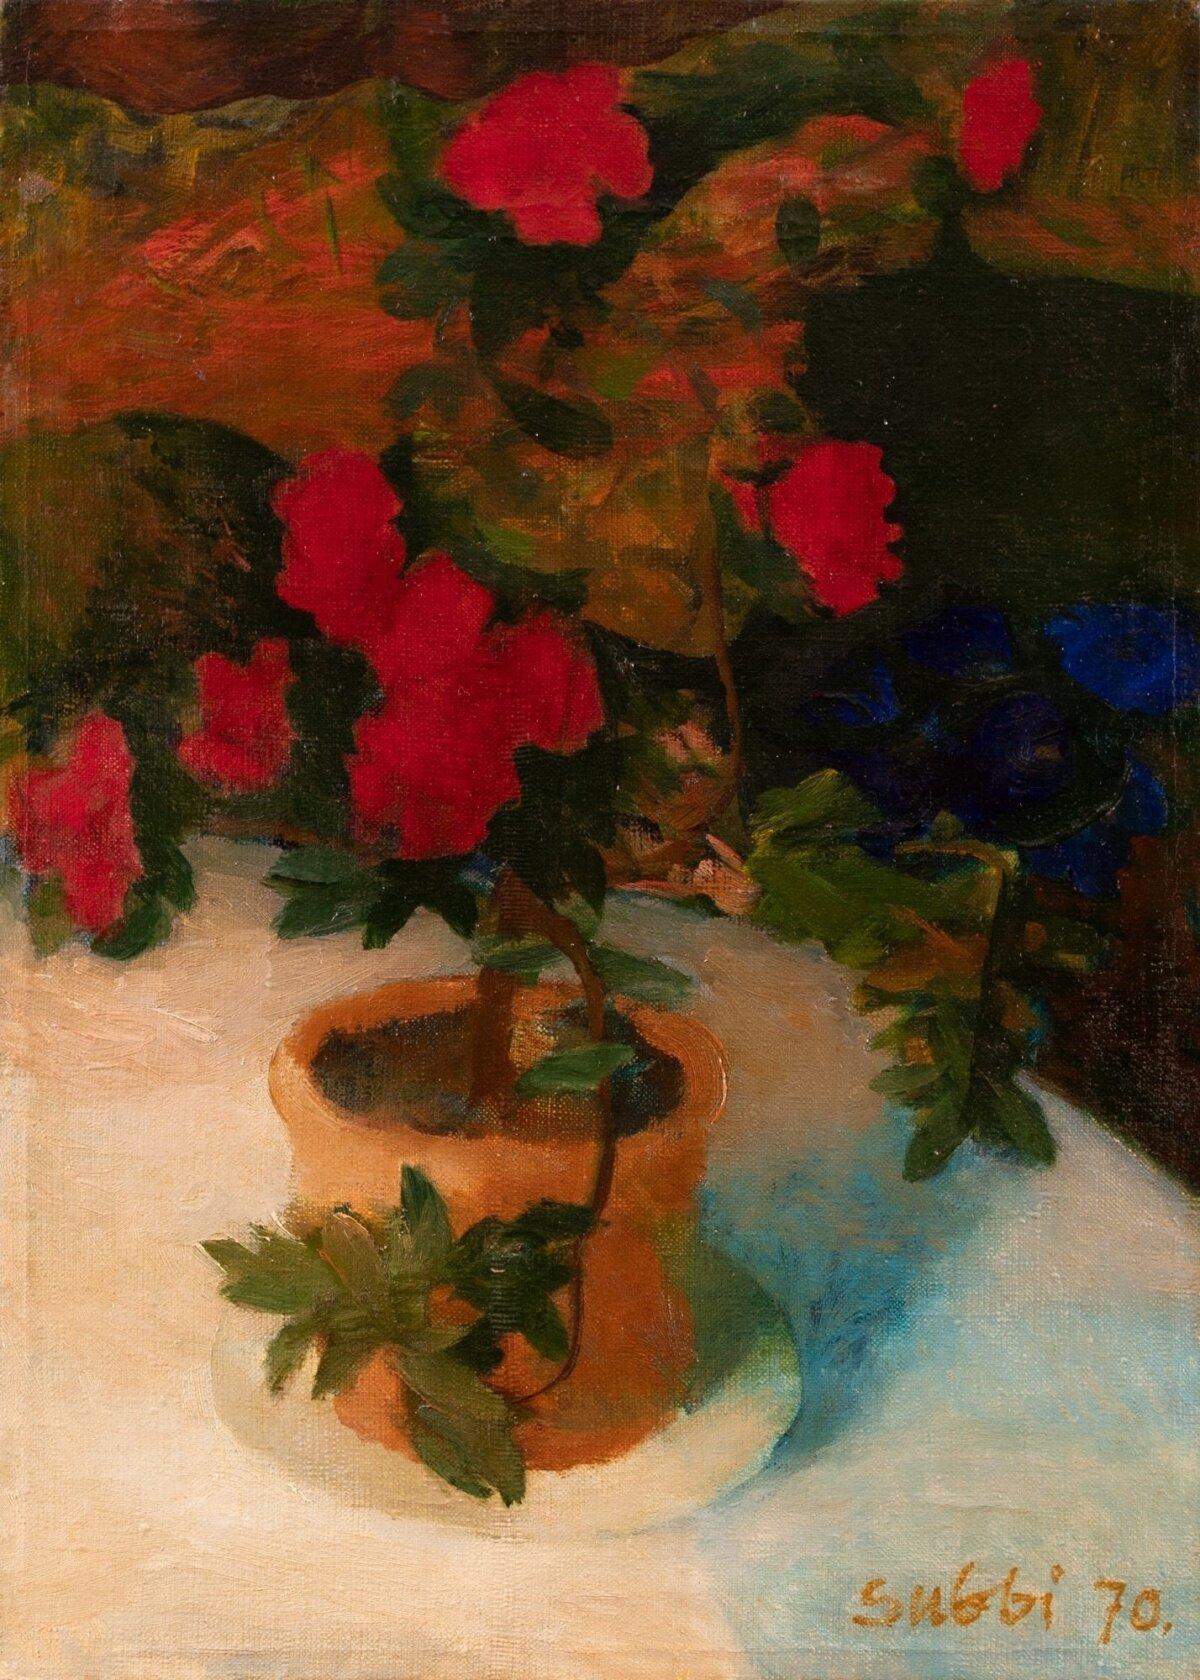 "Olev Subbi ""Väga punane lill"" (1970, tempera, õli, lõuend, 42 x 30,5 cm). Alghind 3500, haamrihind 35 500 eurot."